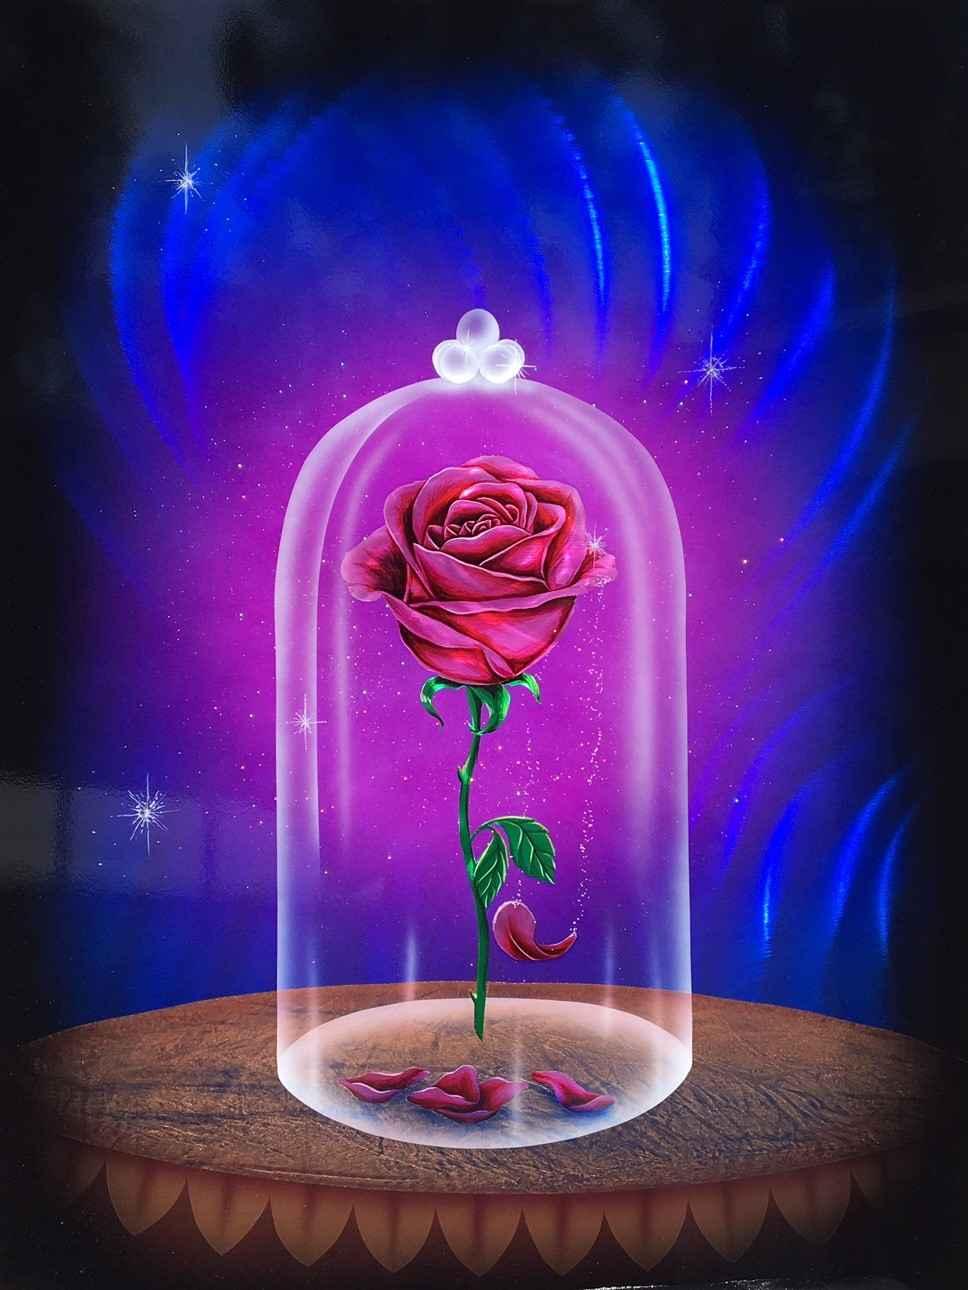 The Enchanted Rose # 5 by  Cris Woloszak - Masterpiece Online